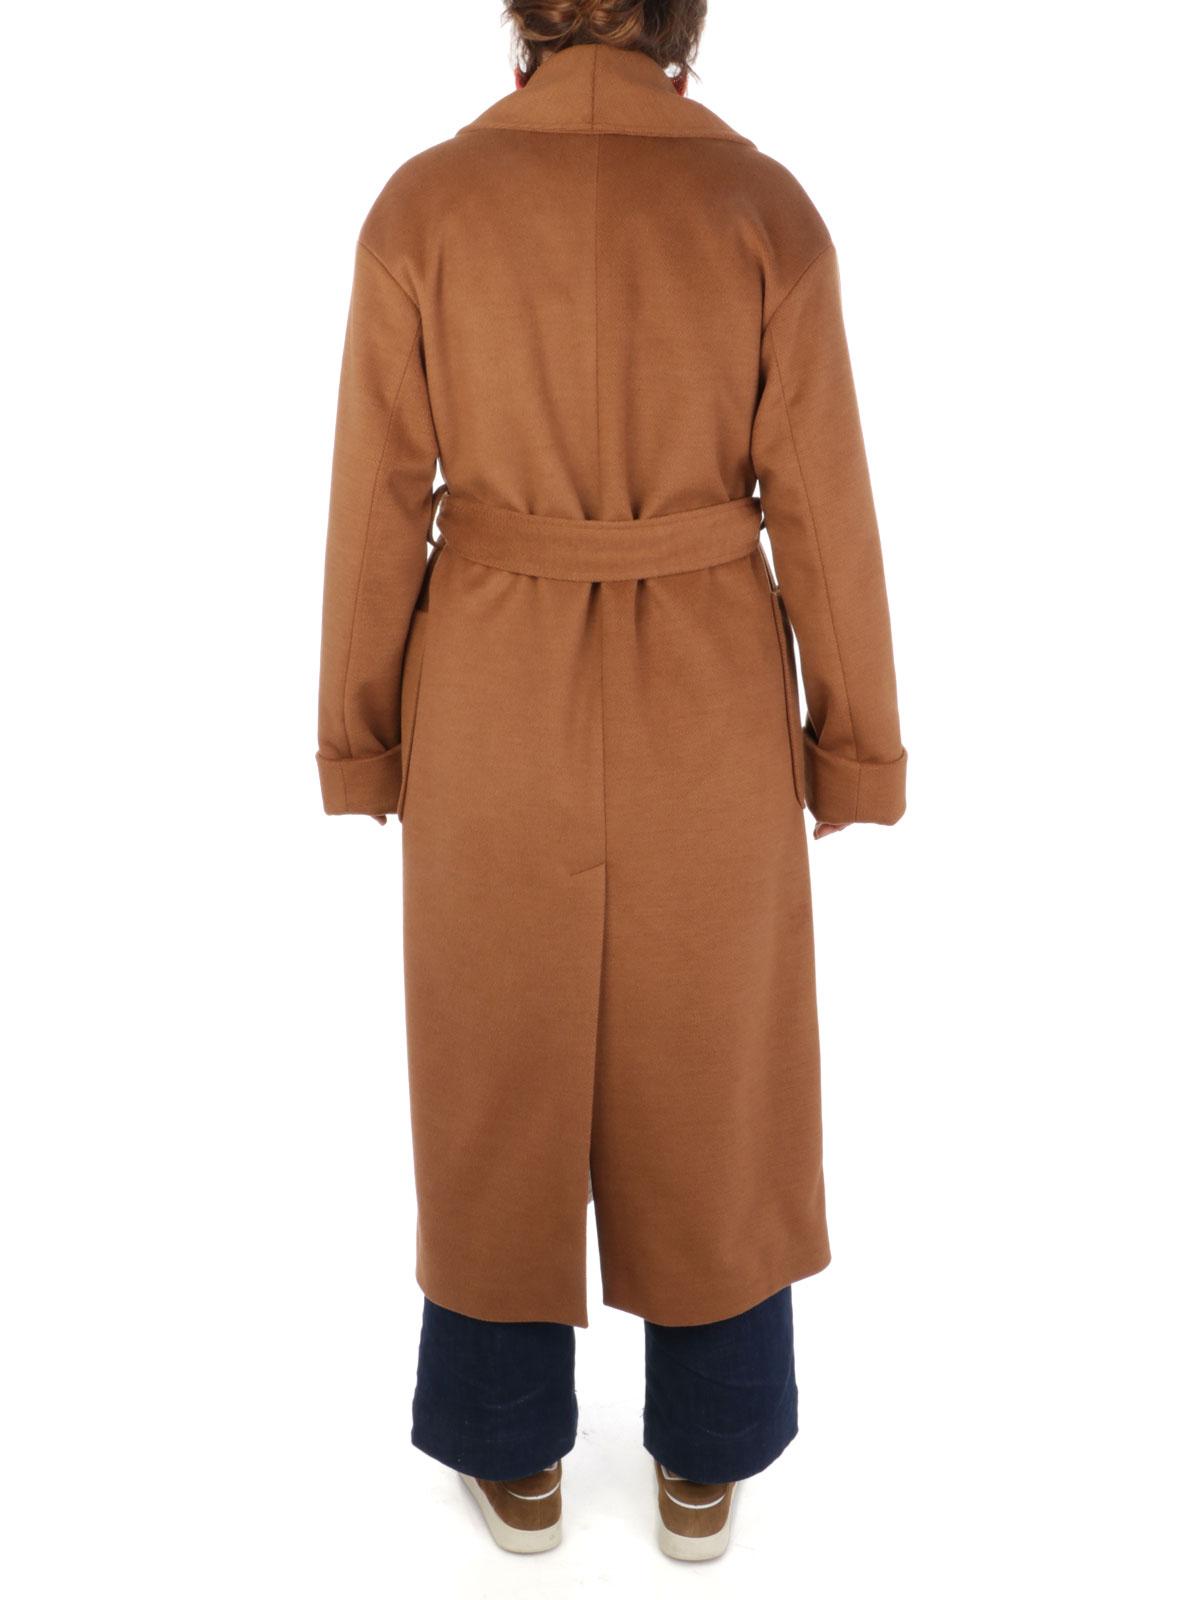 Picture of Prive` | Coat Cappotto Marilu`